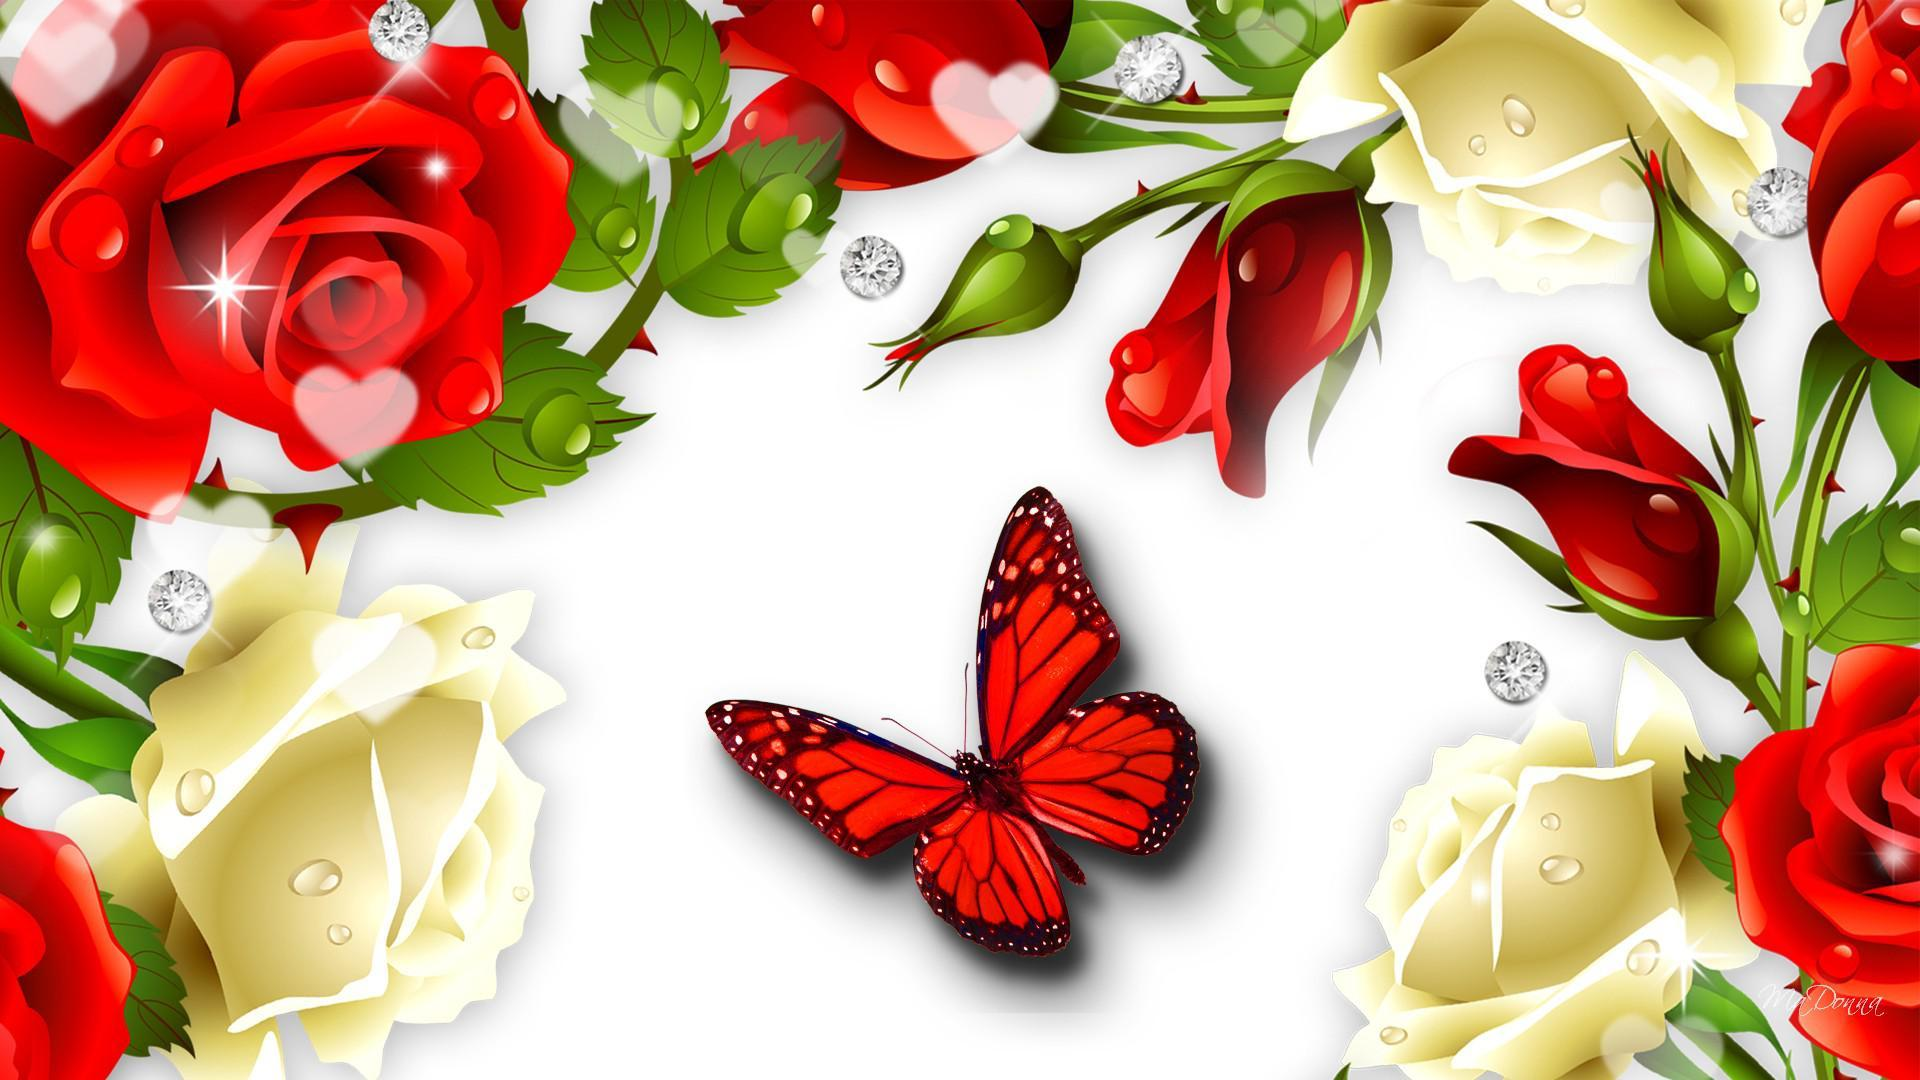 Фон с розами для открытки